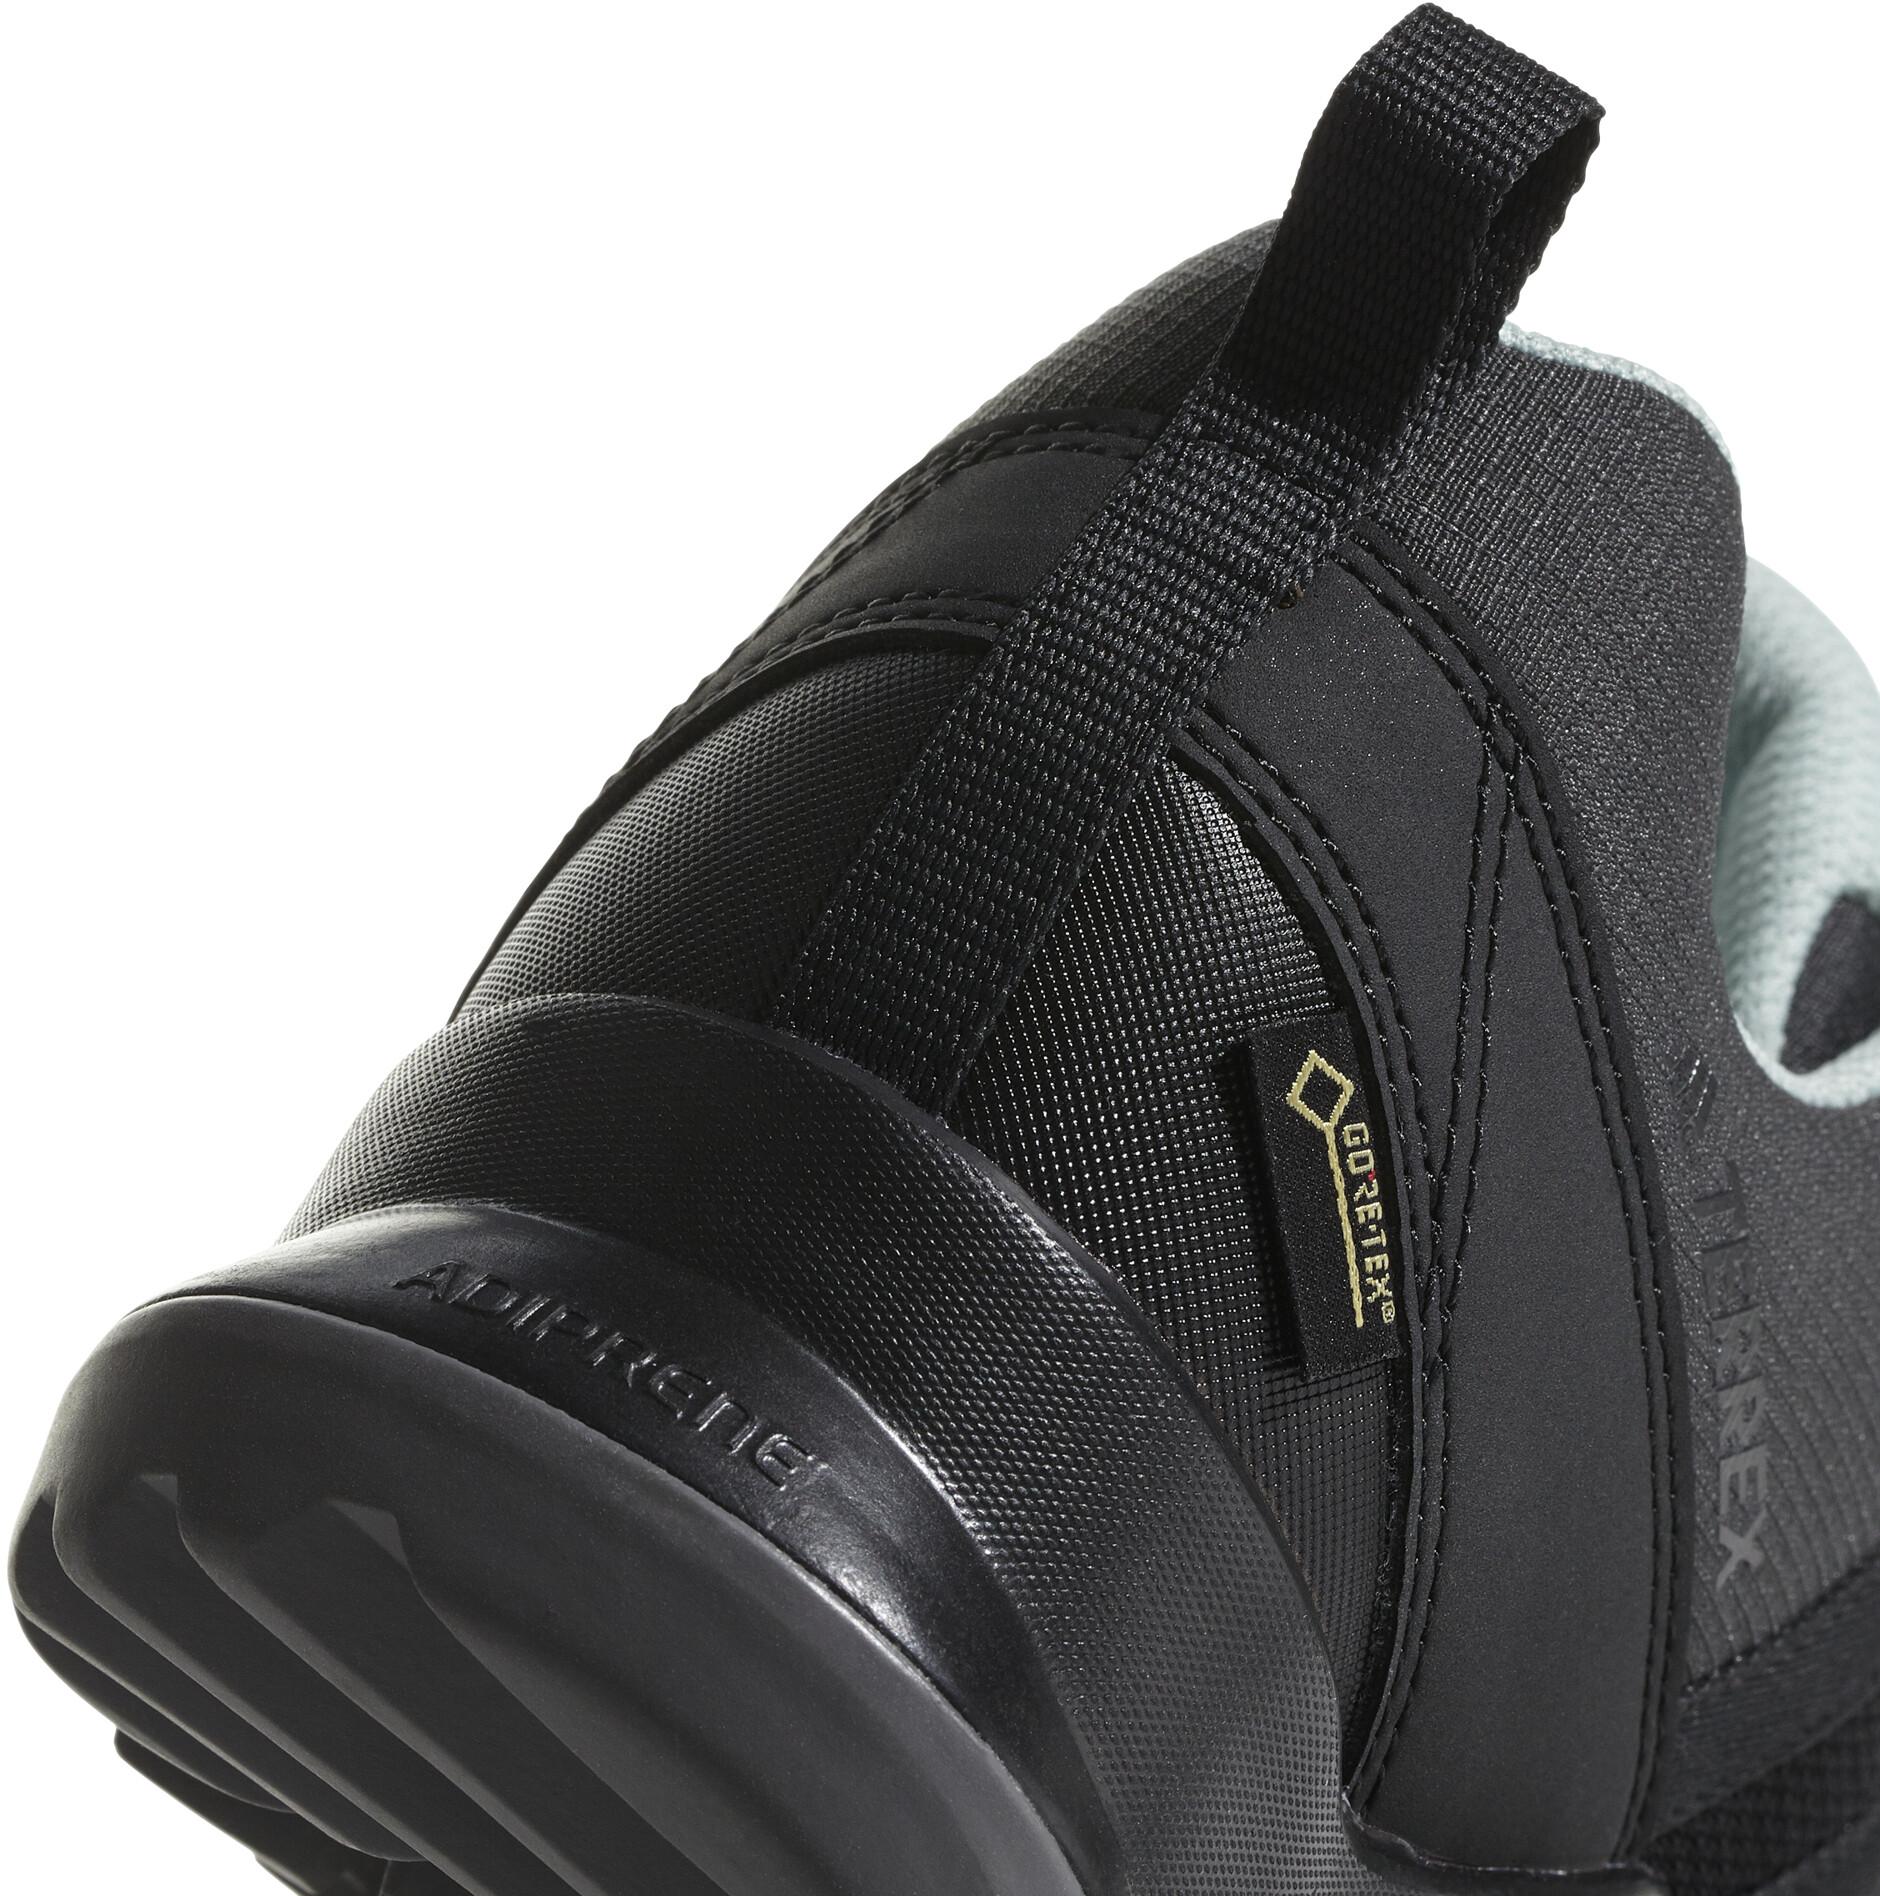 25959d49311 adidas TERREX AX2R GTX Schoenen Dames zwart l Online bij outdoor ... adidas  terrex